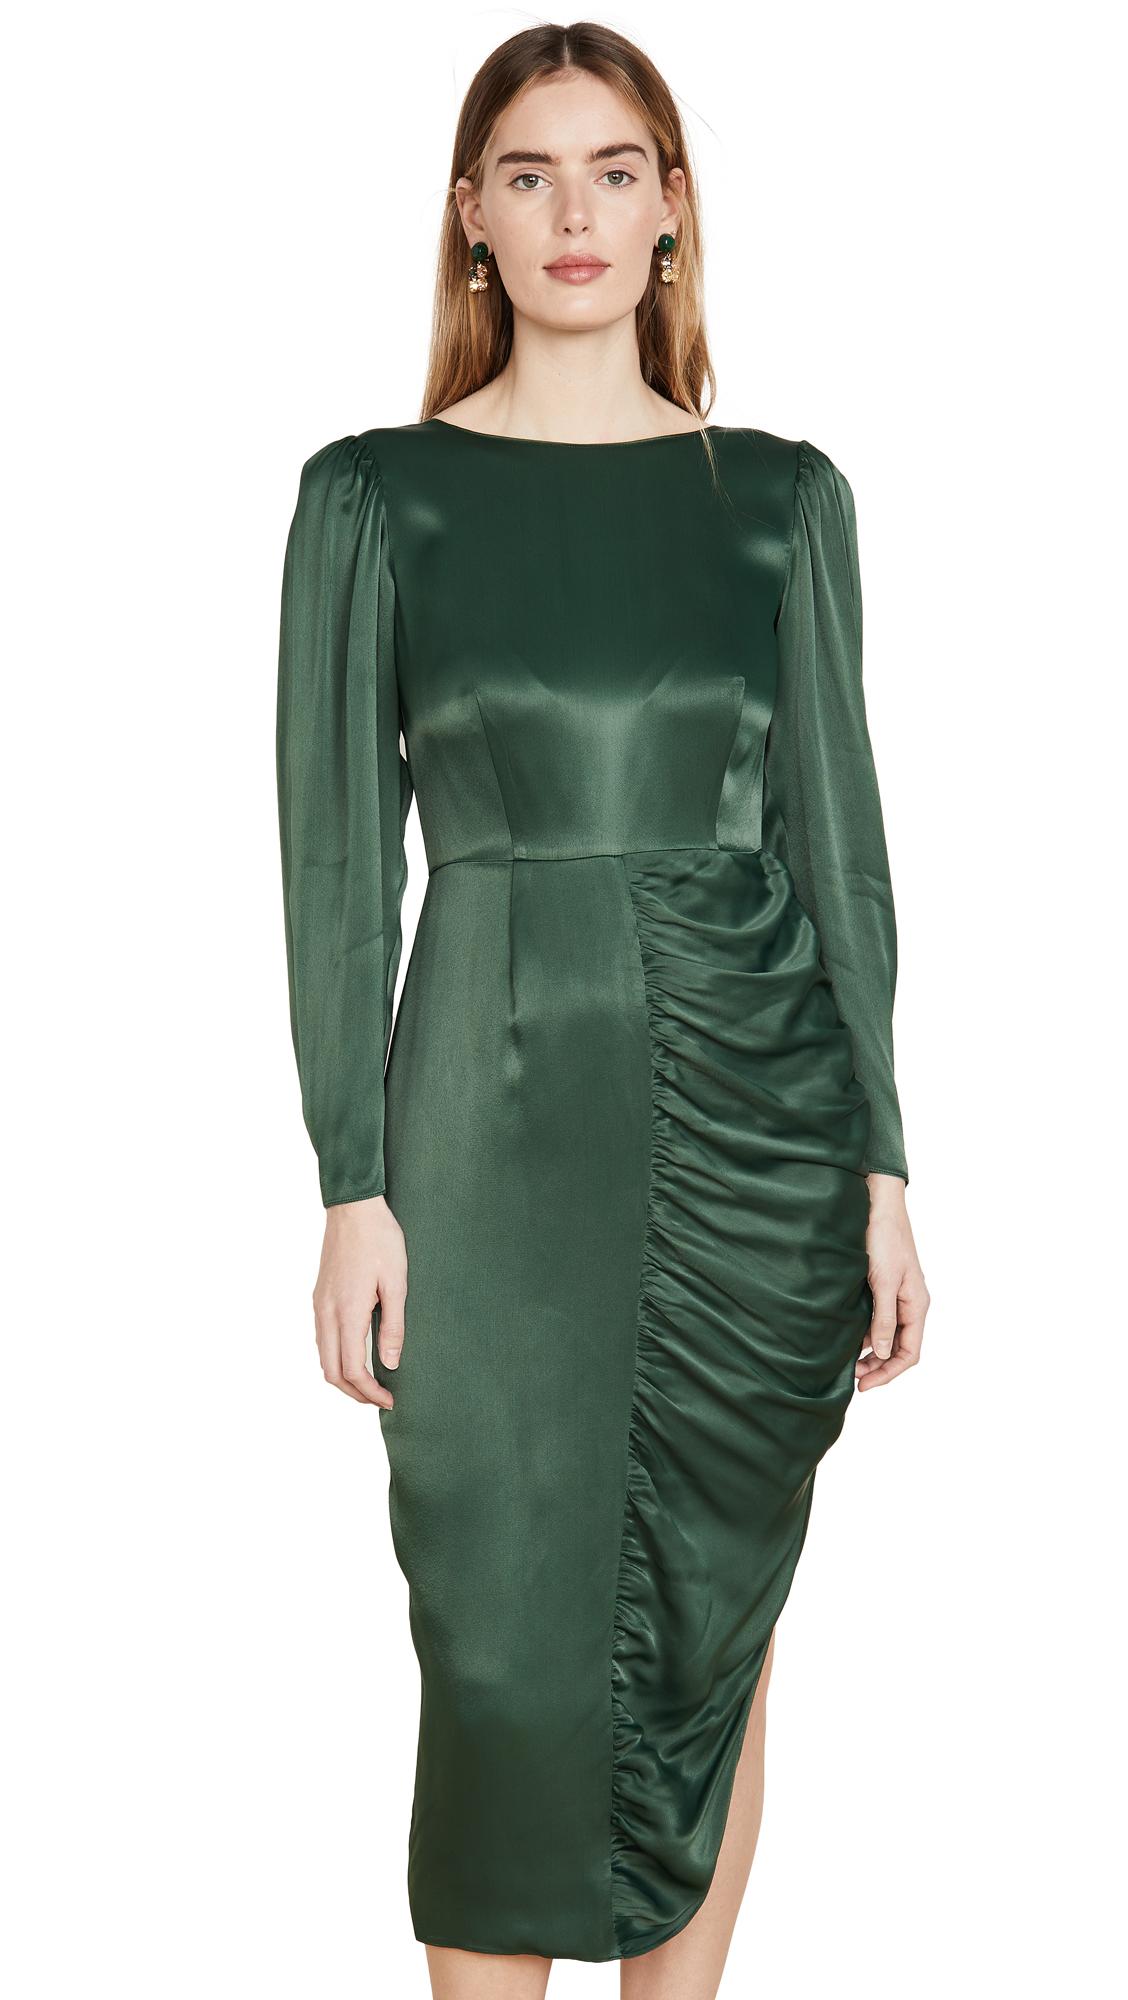 ALEXACHUNG Gathered Dress Crepe Satin - 60% Off Sale